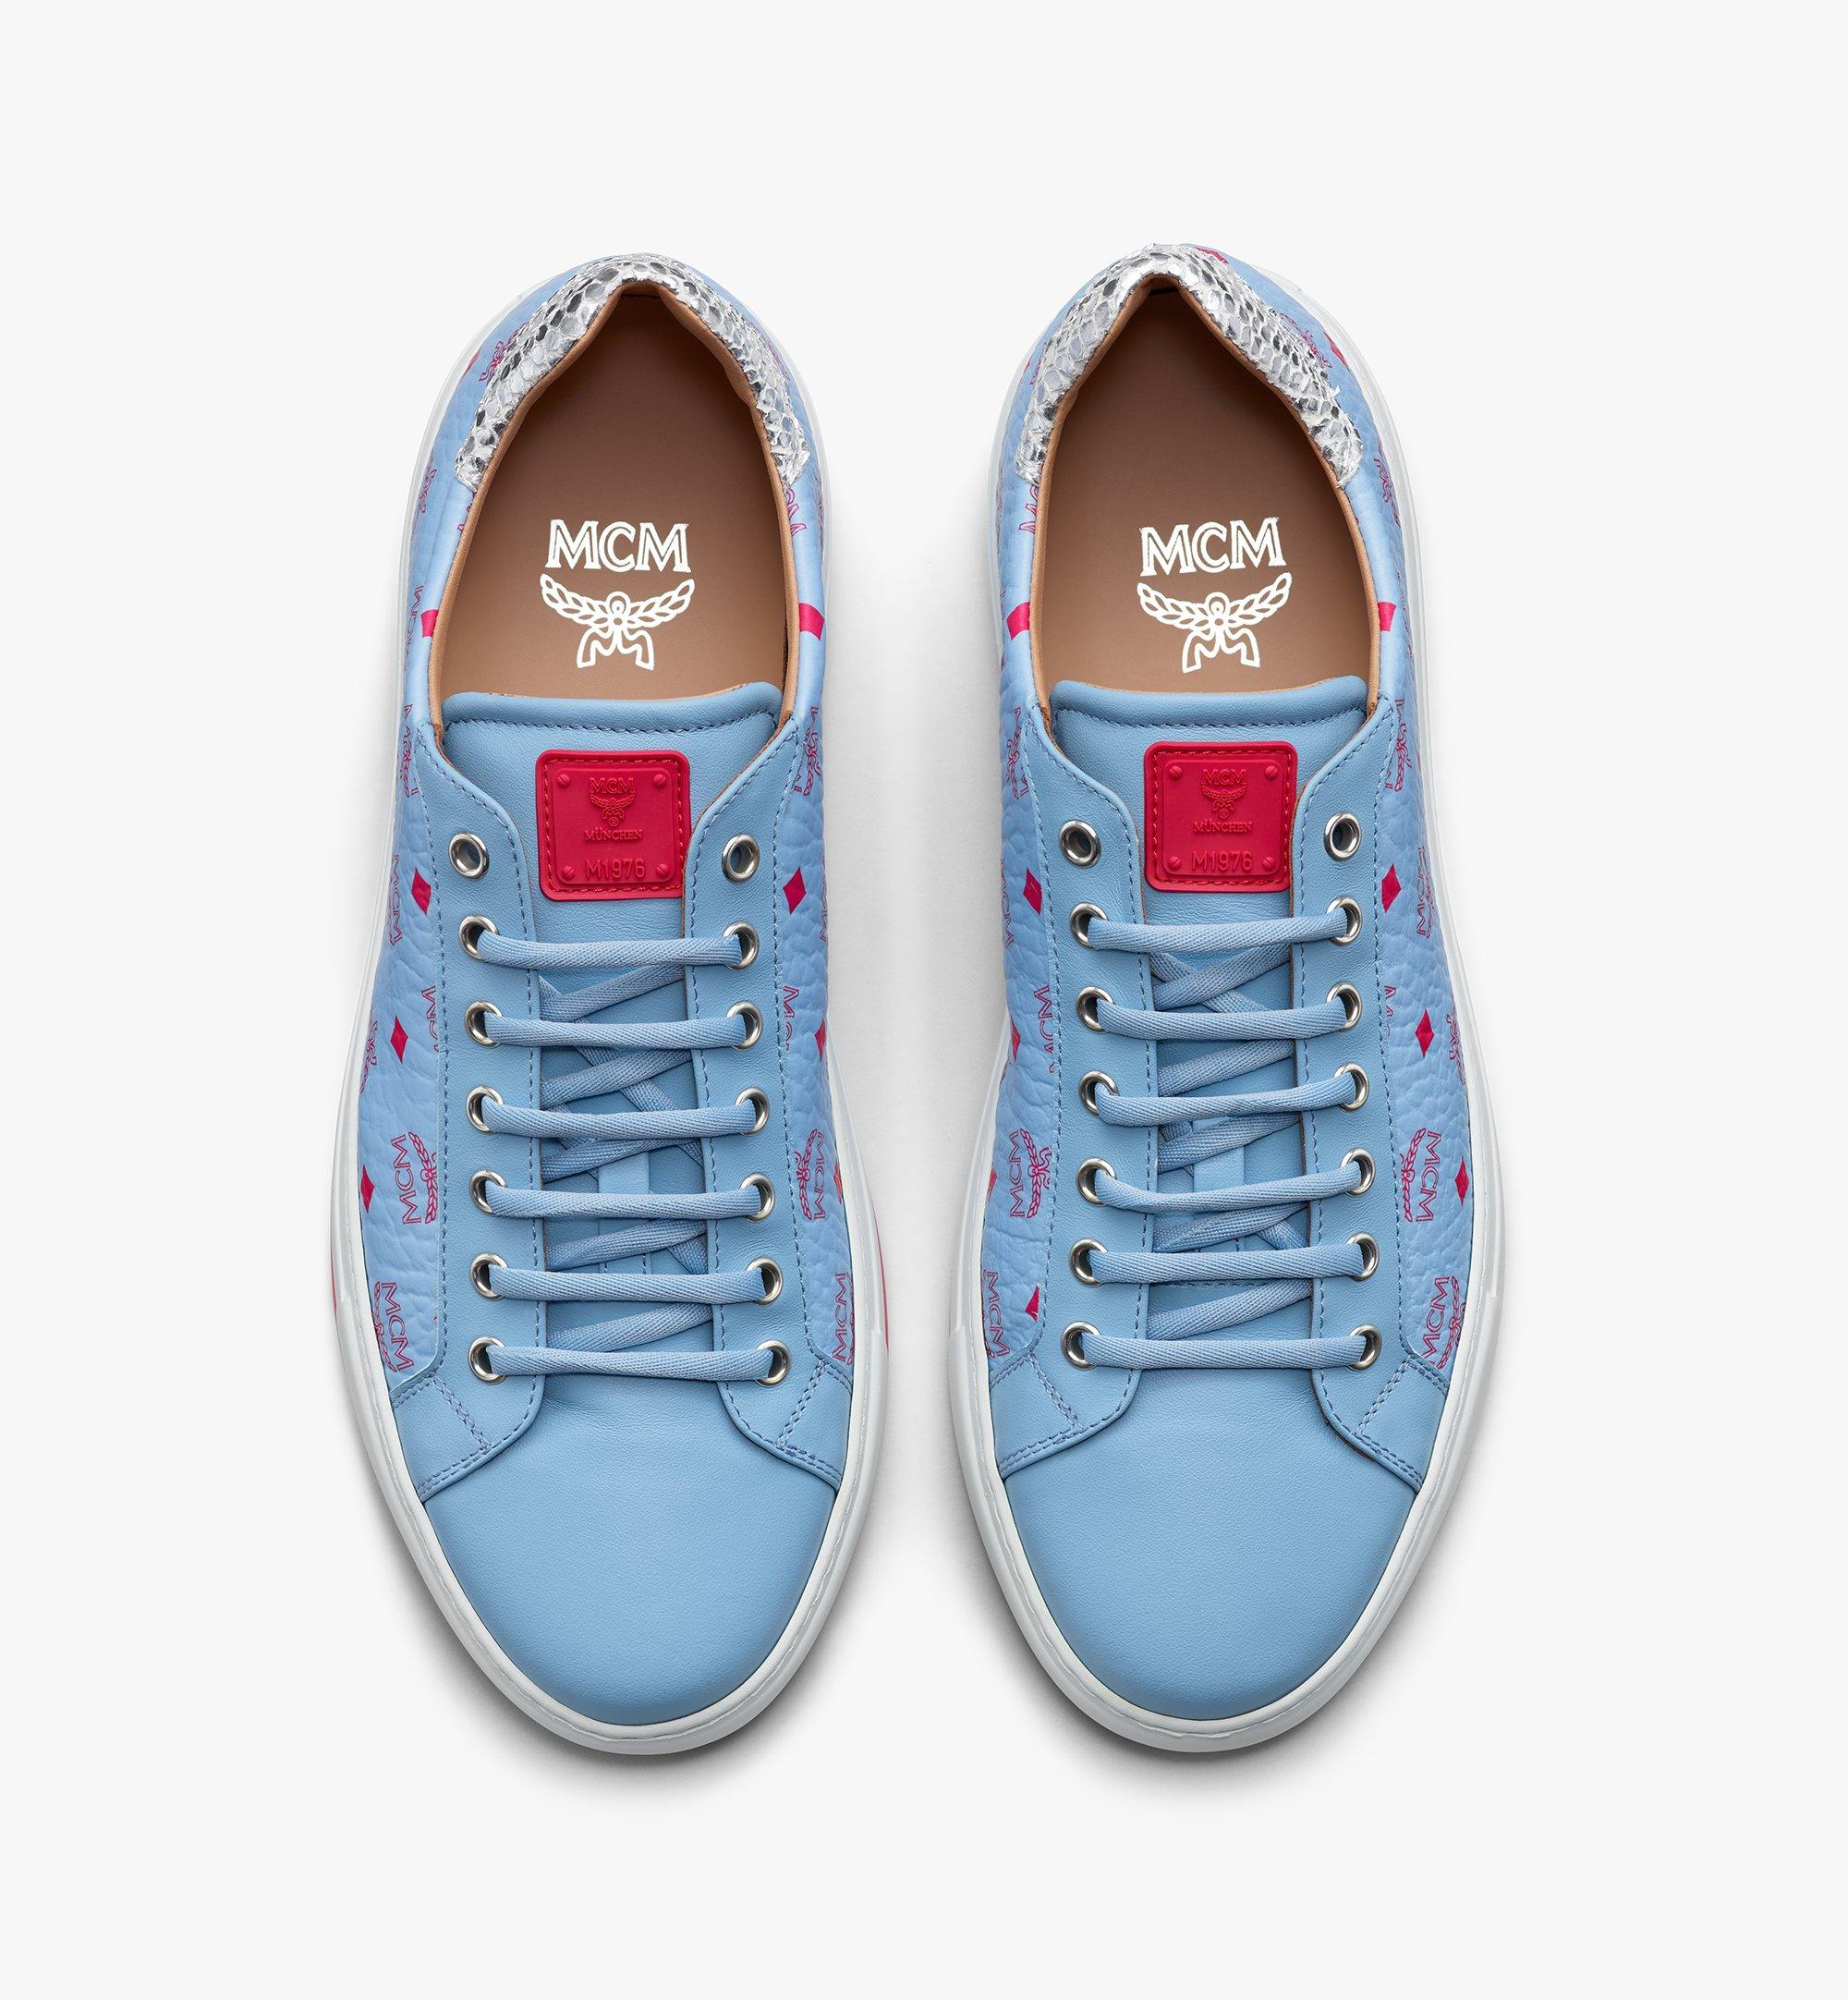 MCM Women's Low-Top Sneakers in Visetos White MESASMM14H2036 Alternate View 5